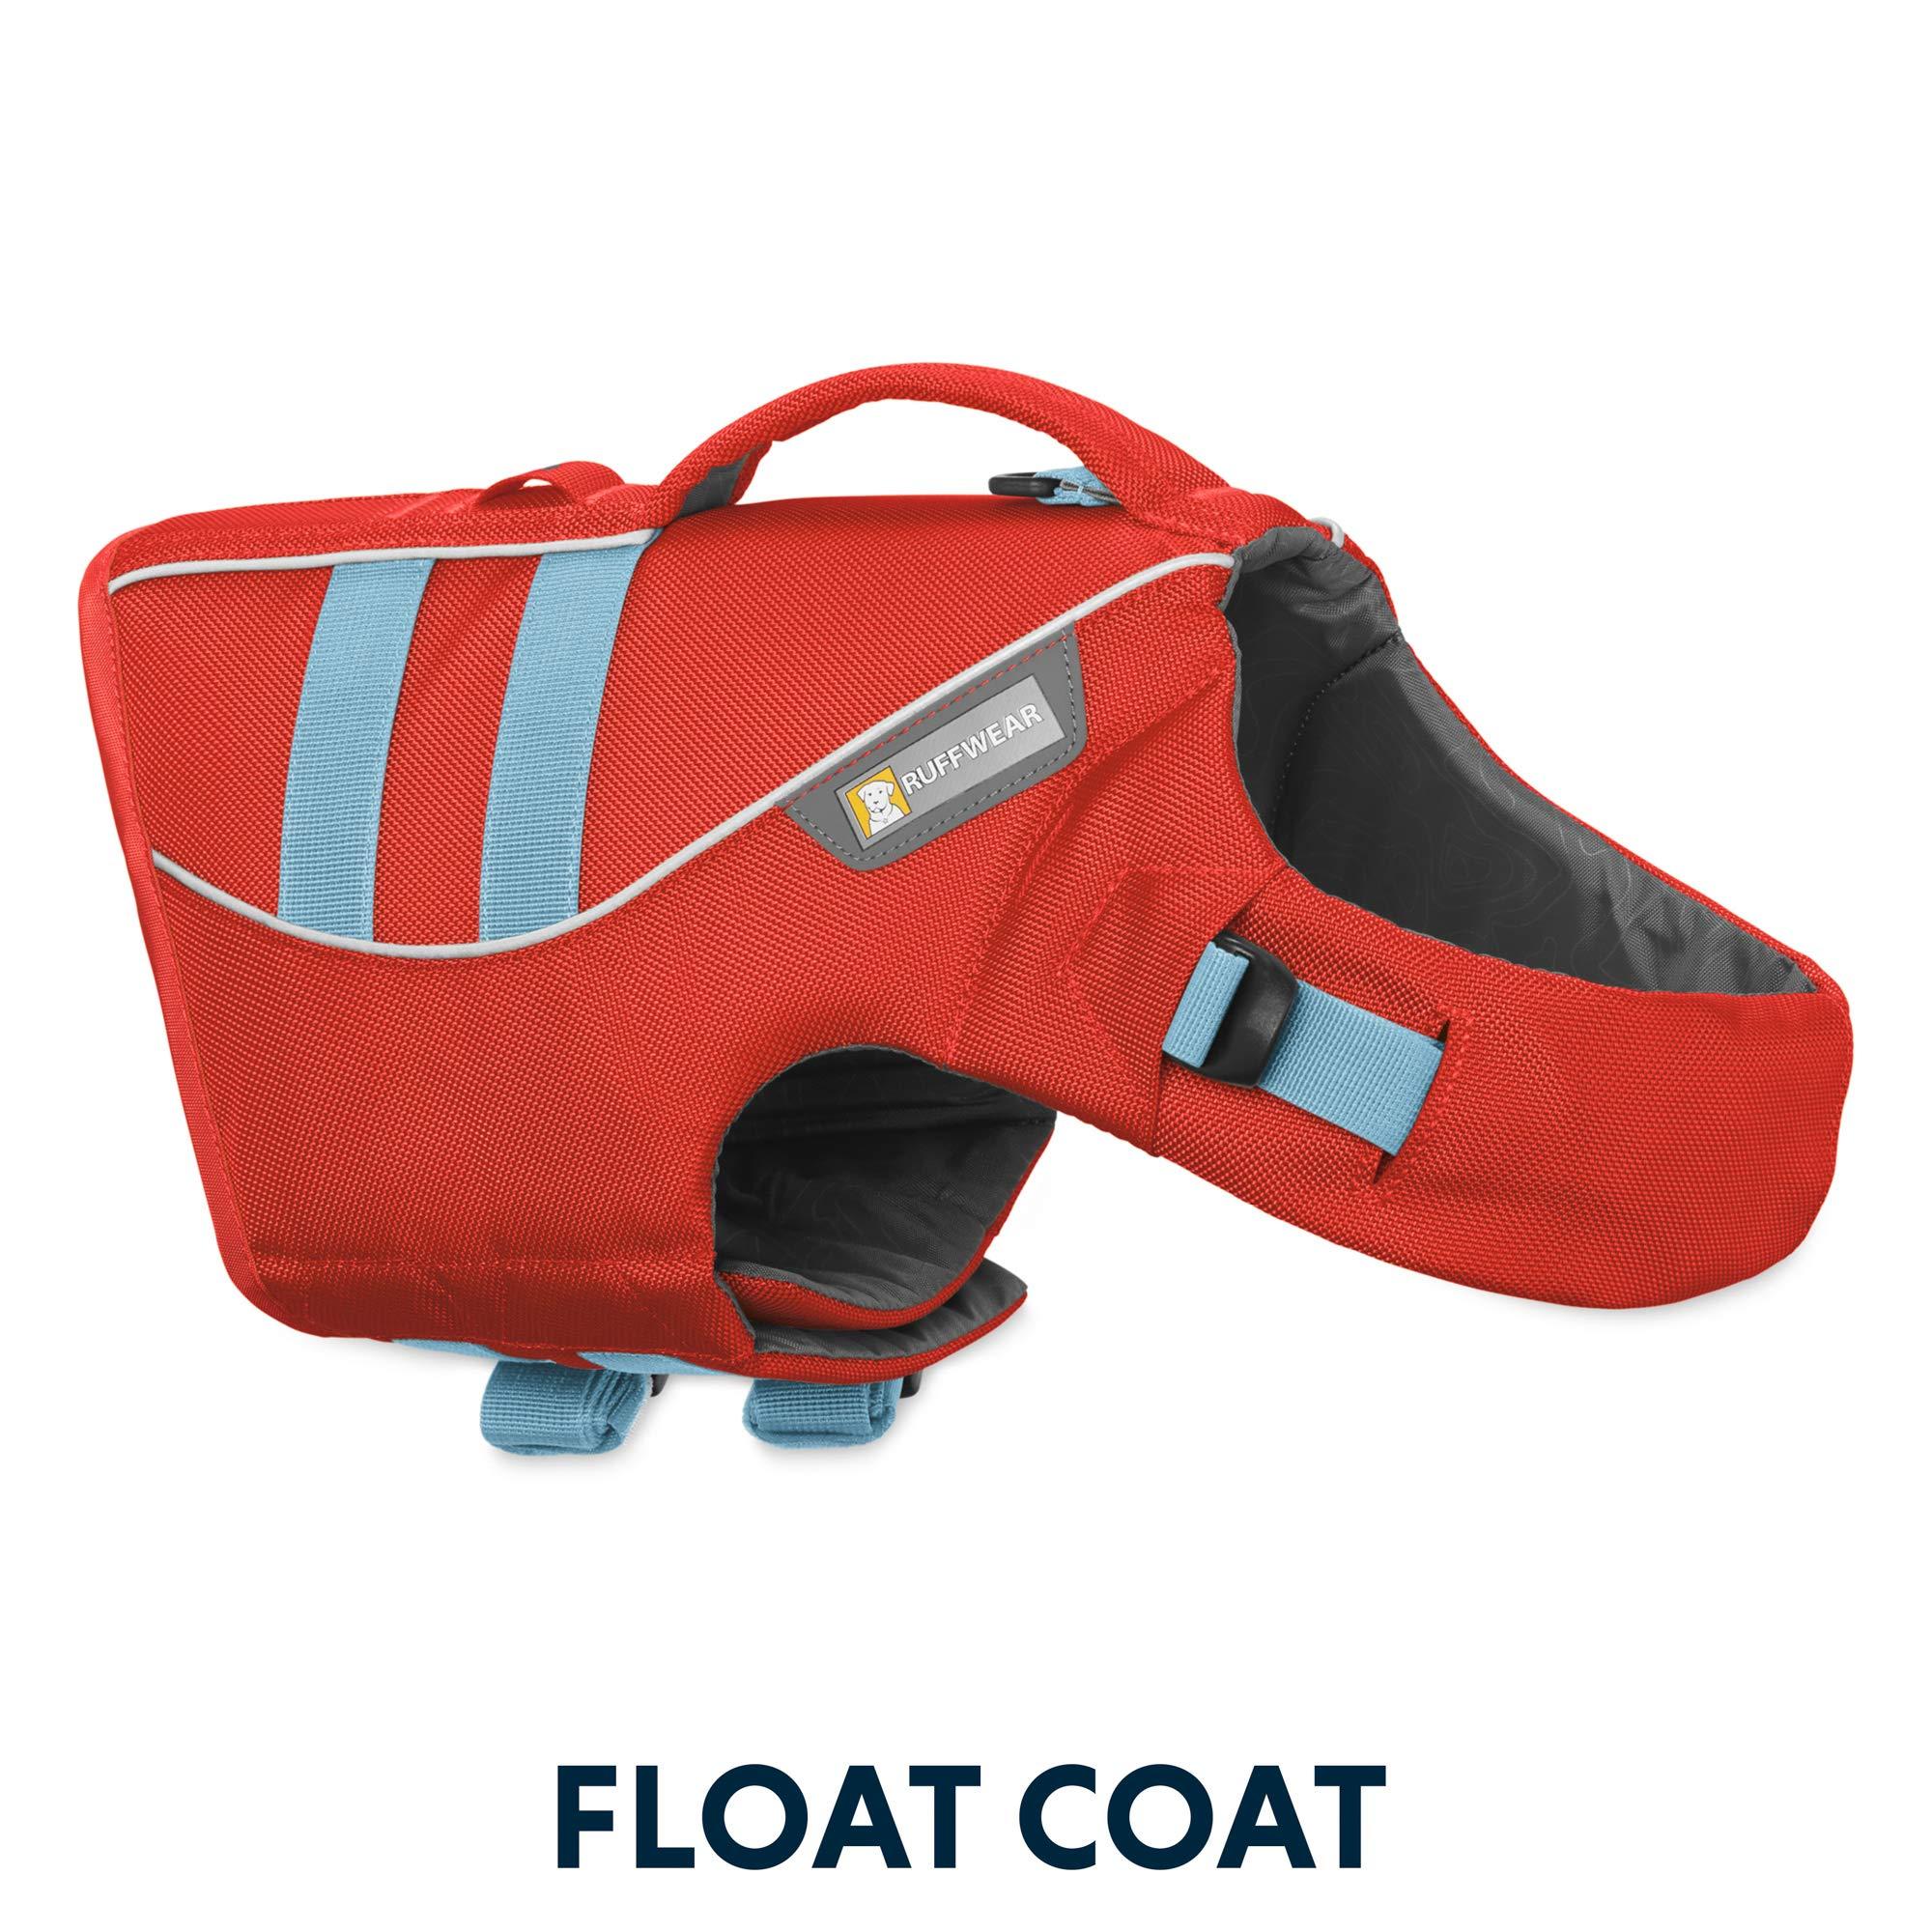 RUFFWEAR - Float Coat Dog Life Jacket for Swimming, Adjustable and Reflective, Sockeye Red, Medium by RUFFWEAR